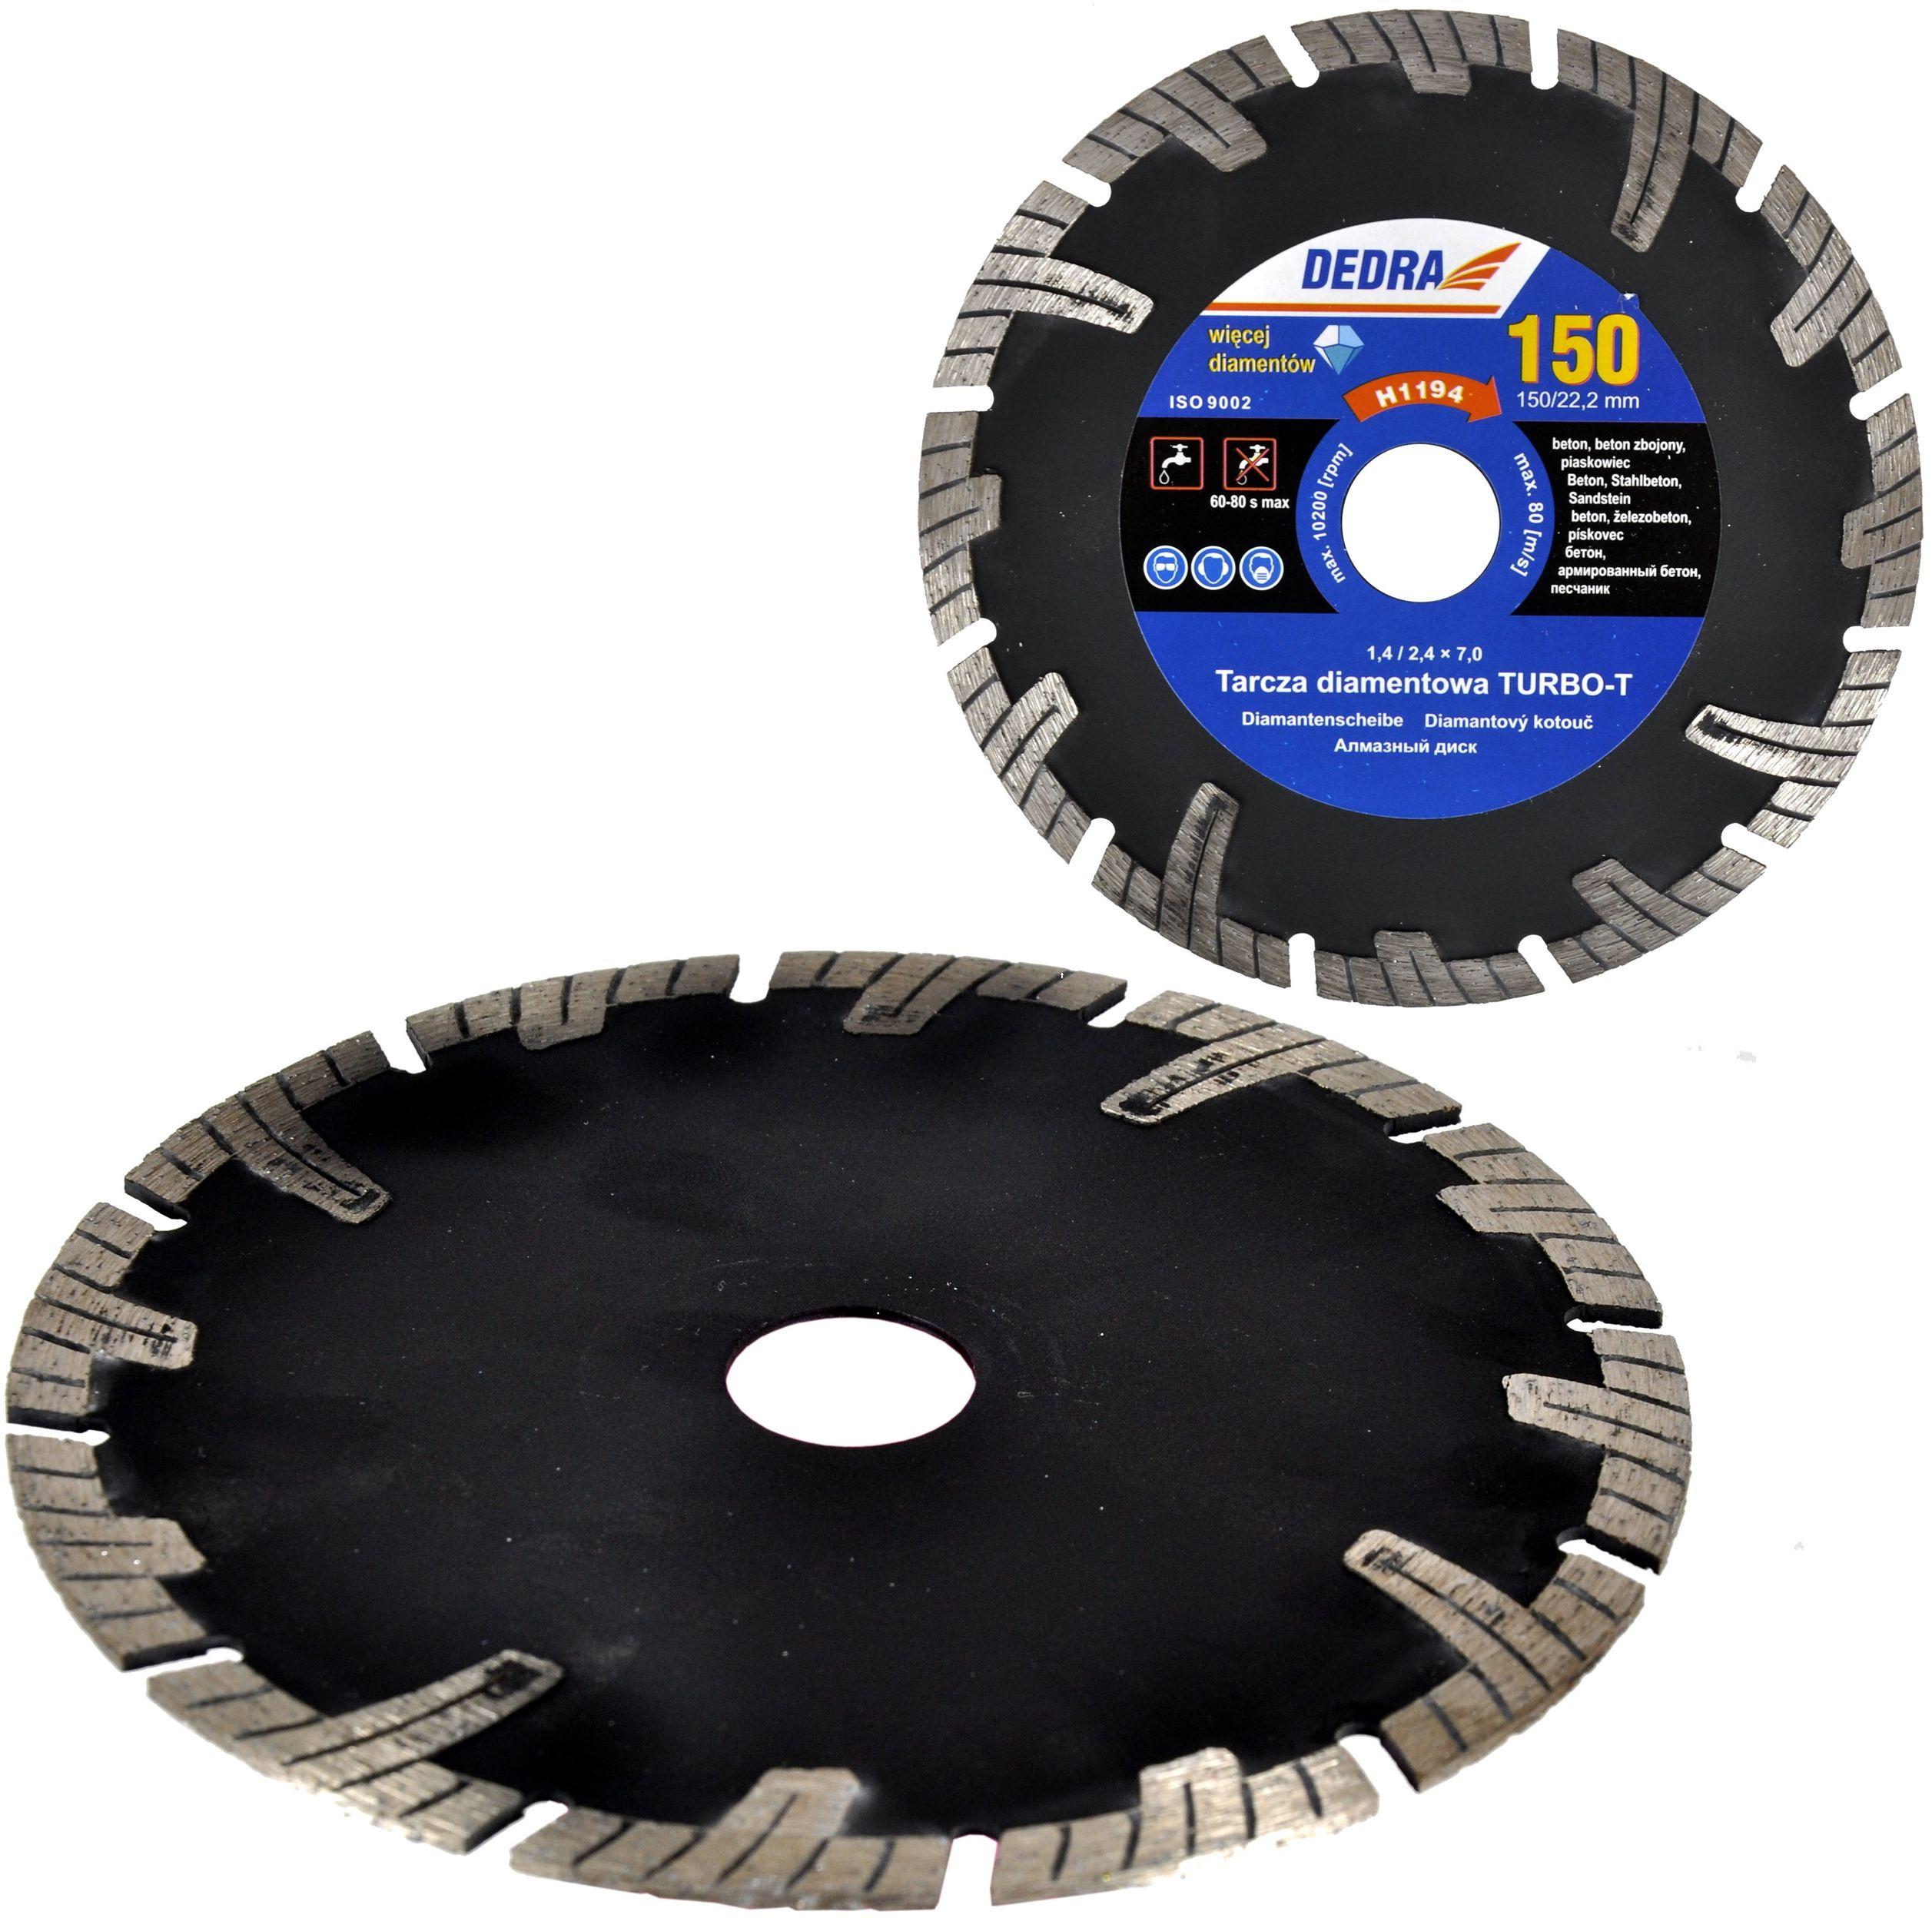 Piła tarczowa tarcza diamentowa 200mm 25,4 betonu